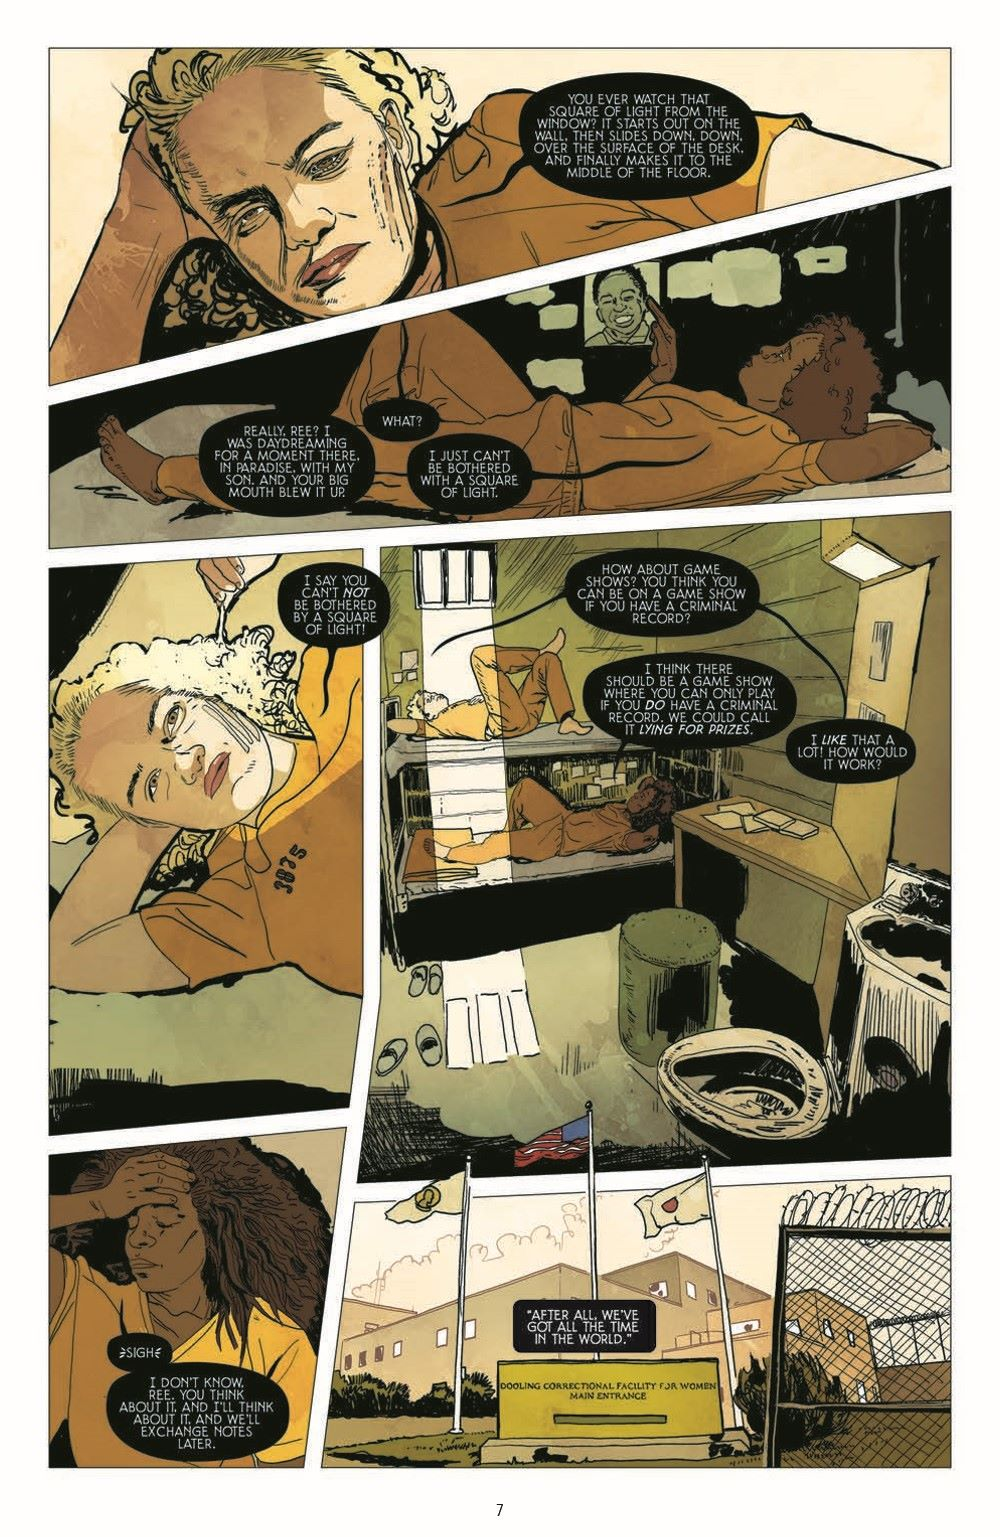 SleepingBeautiesHC_pr-6 ComicList Previews: SLEEPING BEAUTIES VOLUME 1 HC